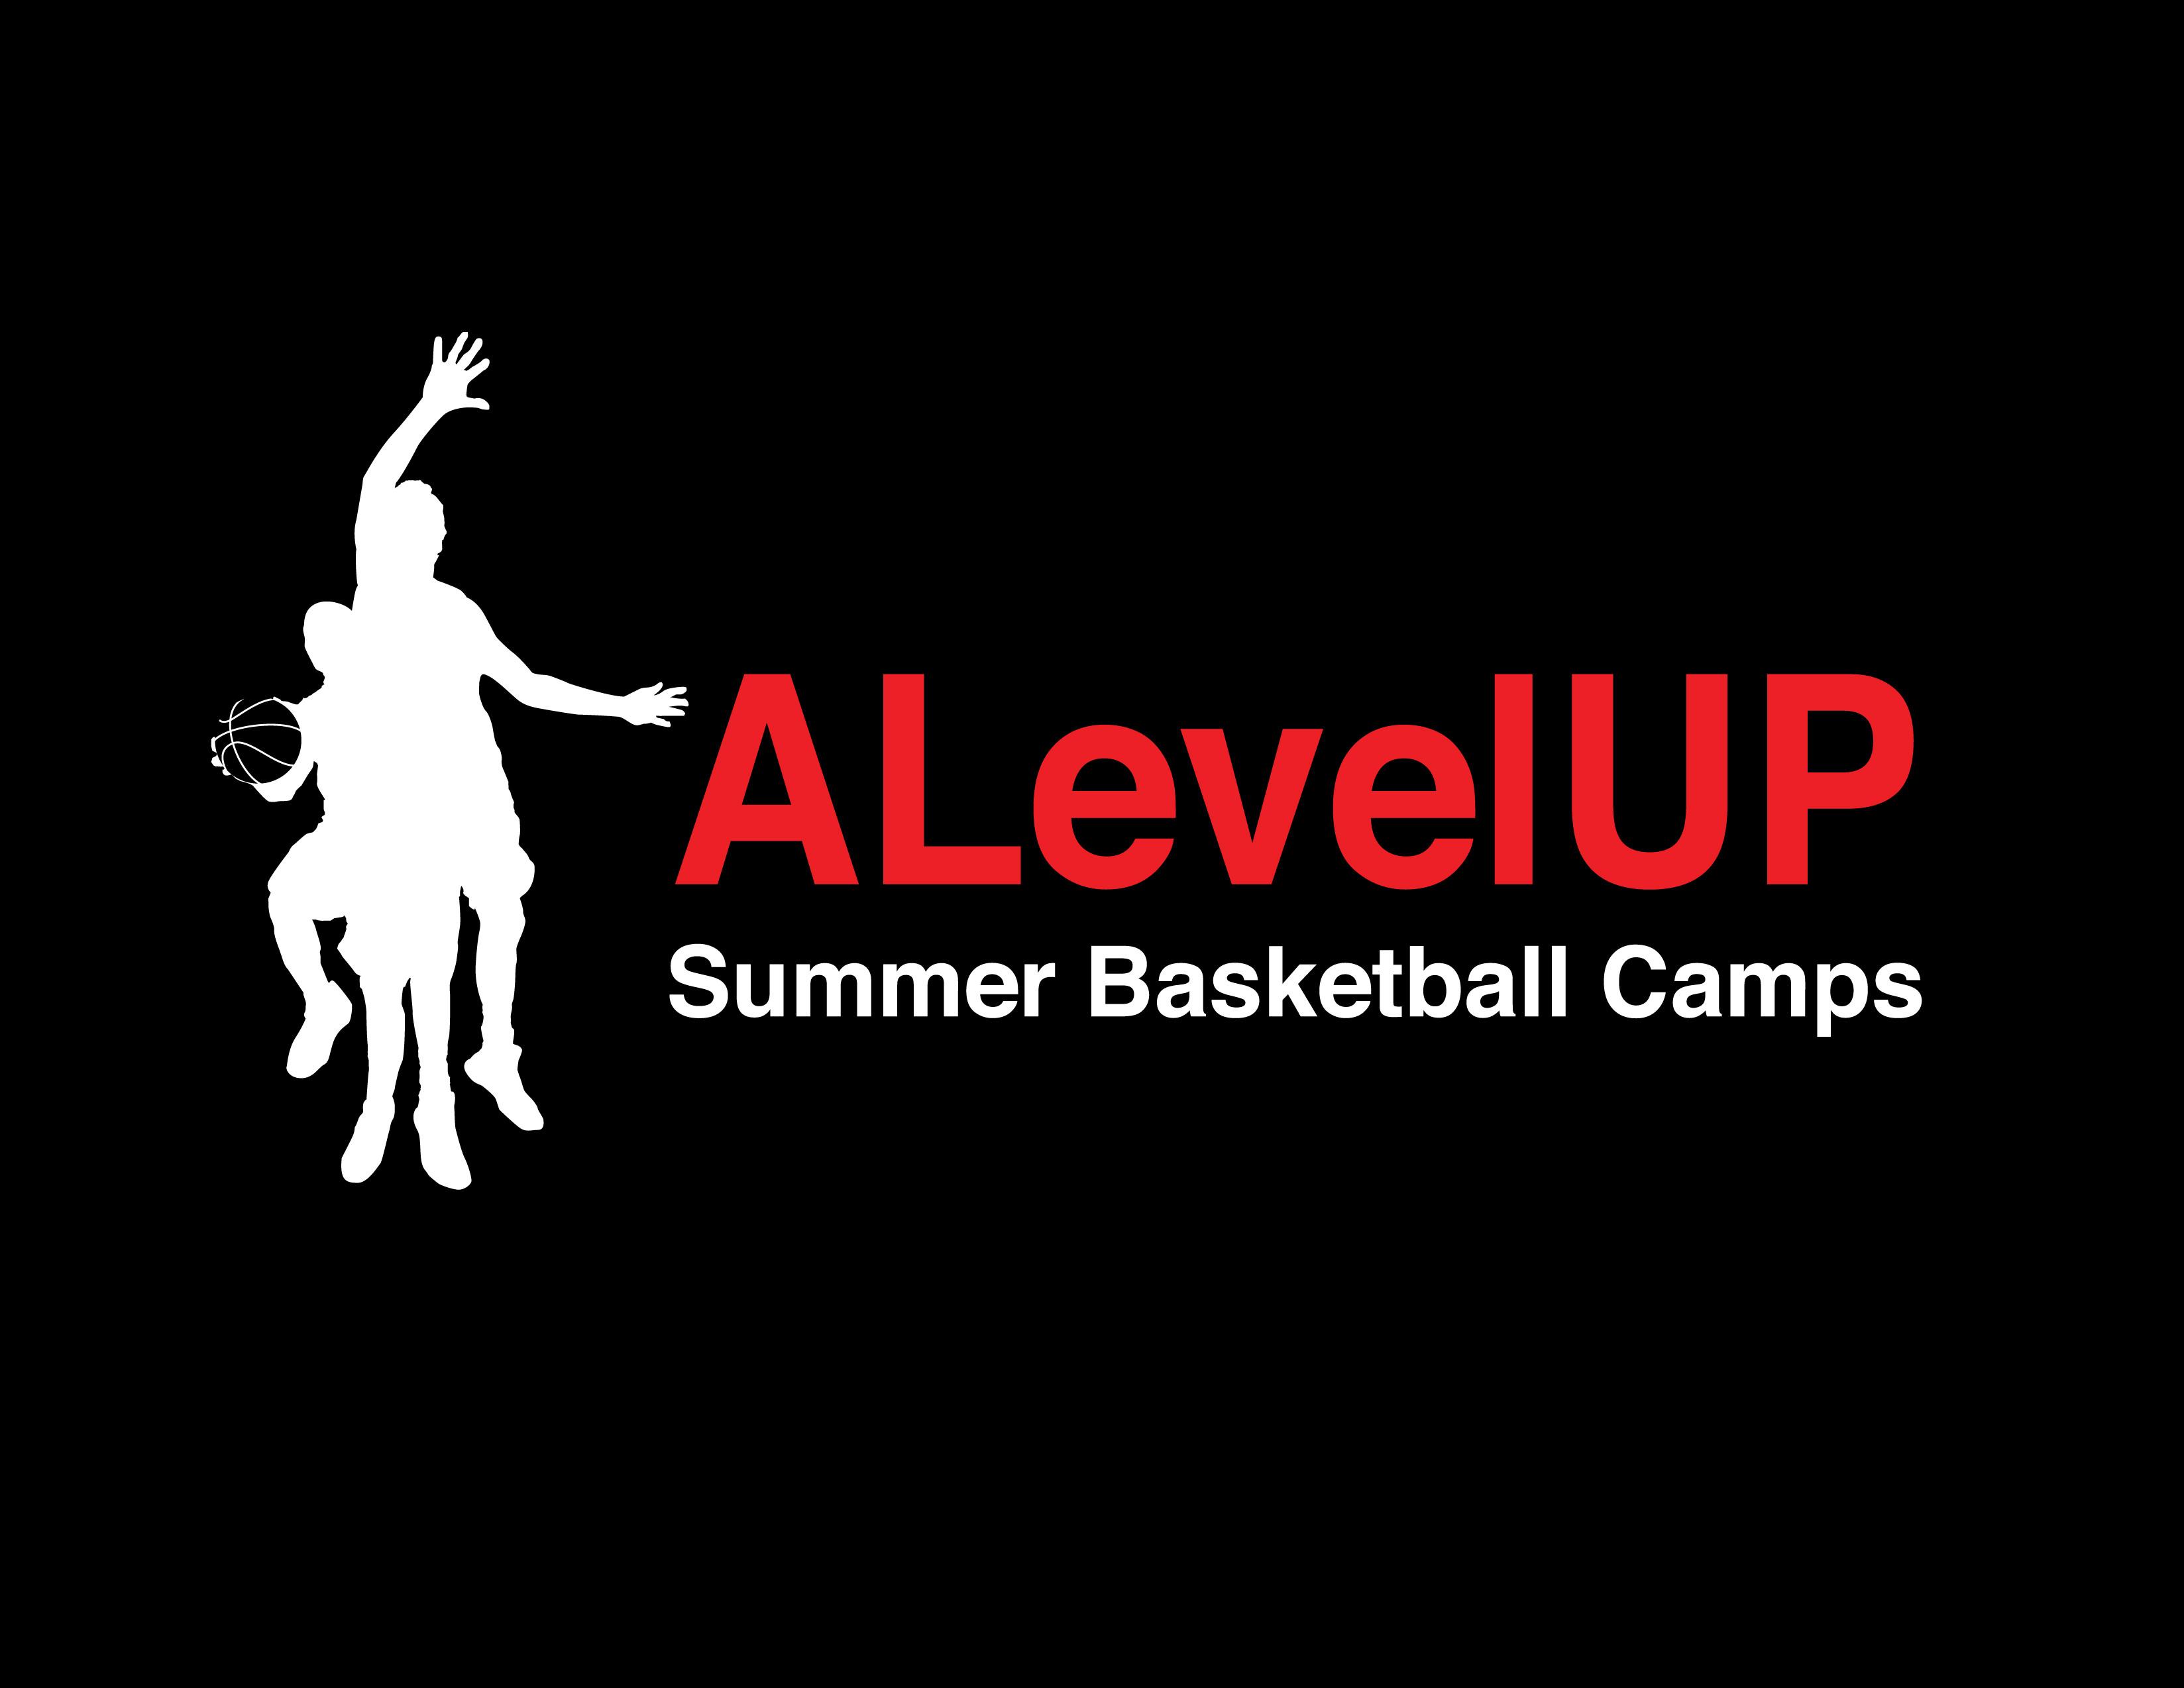 OAKVILLE Summer Camps 9 - 11 yrs old